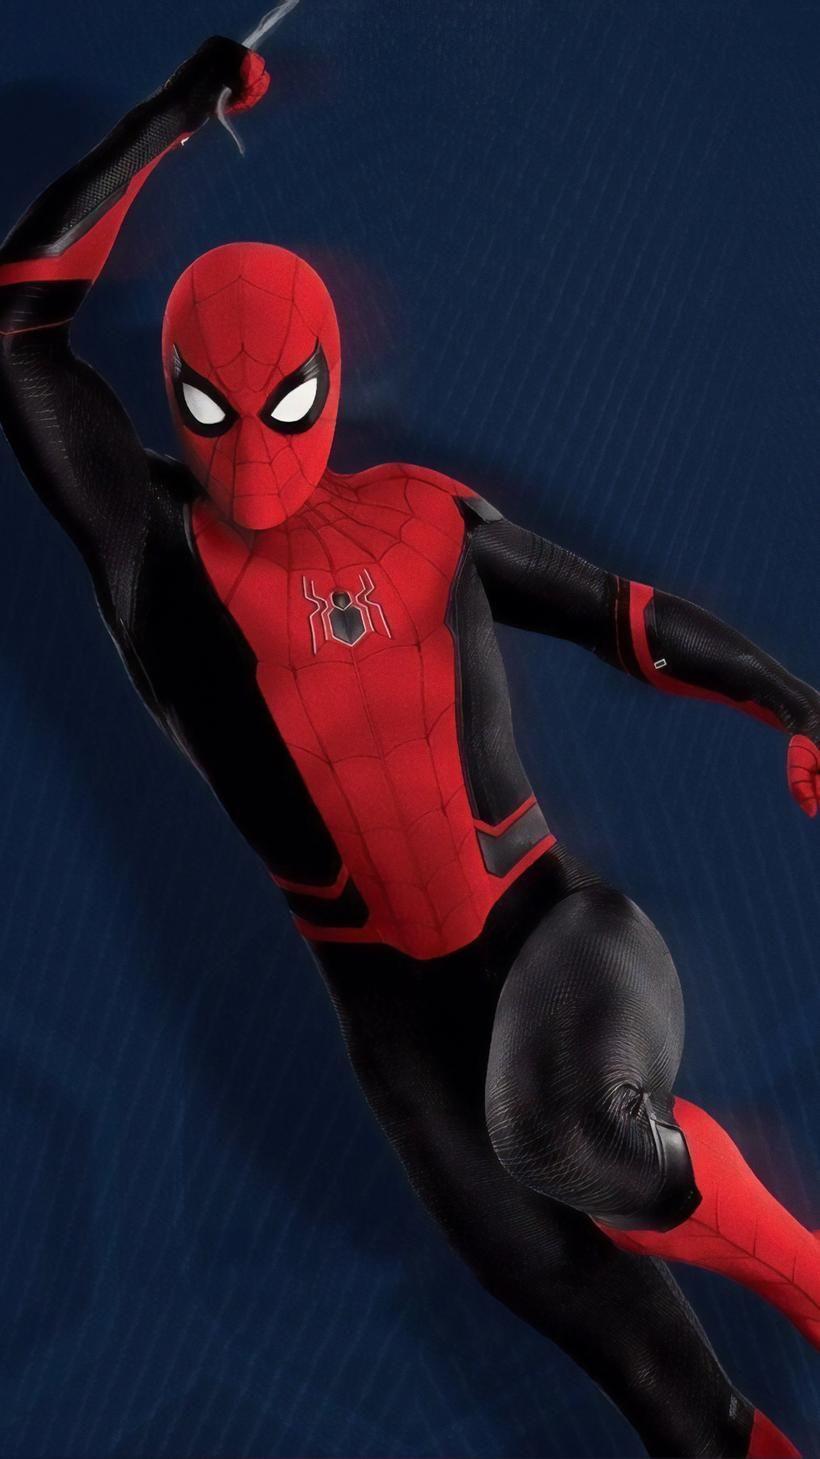 Wallpaper For Spider Man Far From Home 2019 Spiderman Amazing Spiderman Marvel Spiderman